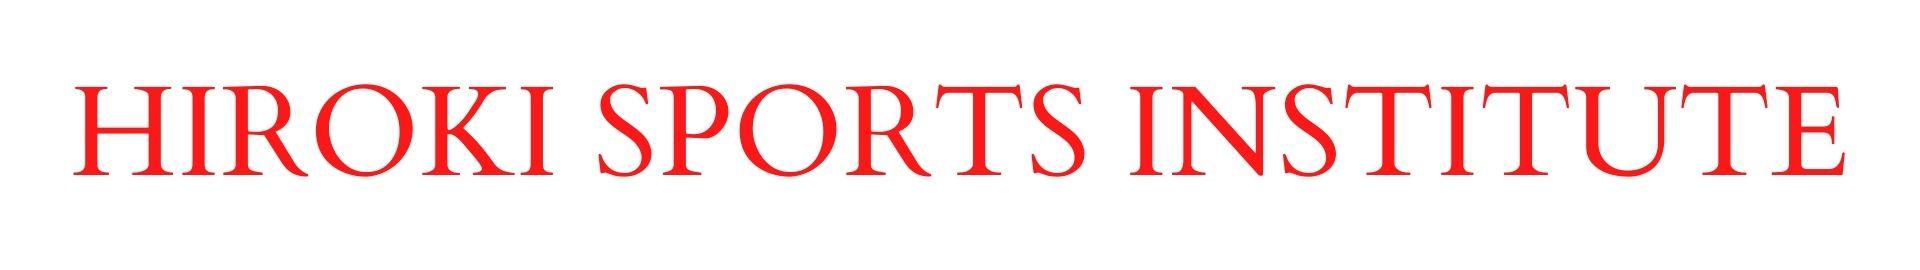 Hiroki Sports Institute